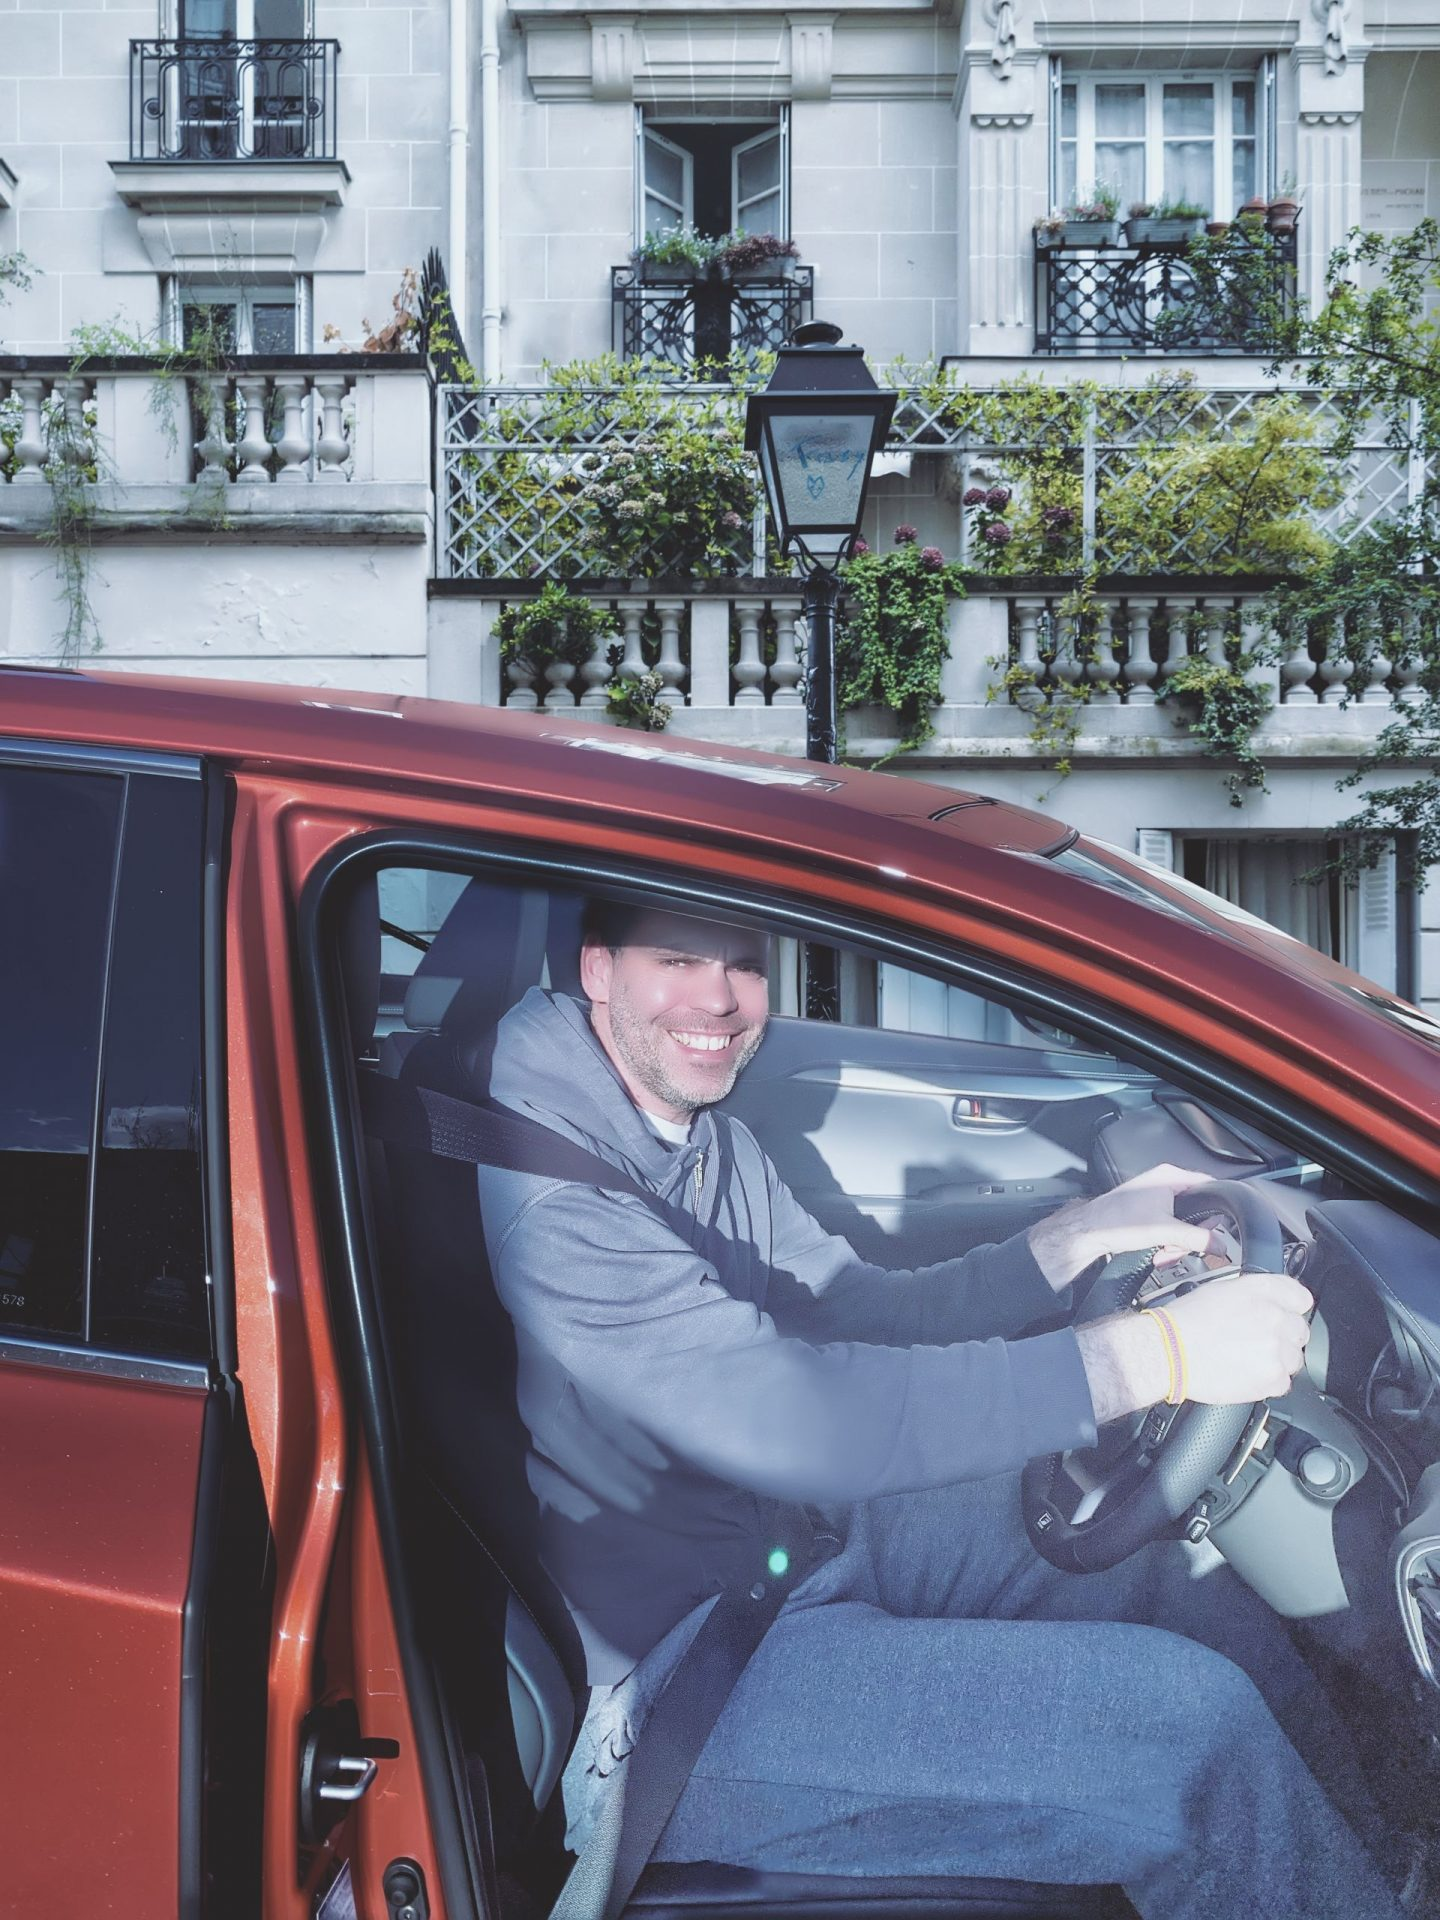 Lexus NX F Sport, Dadbloguk,. uk dad blogger, dad blog, family, family SUV